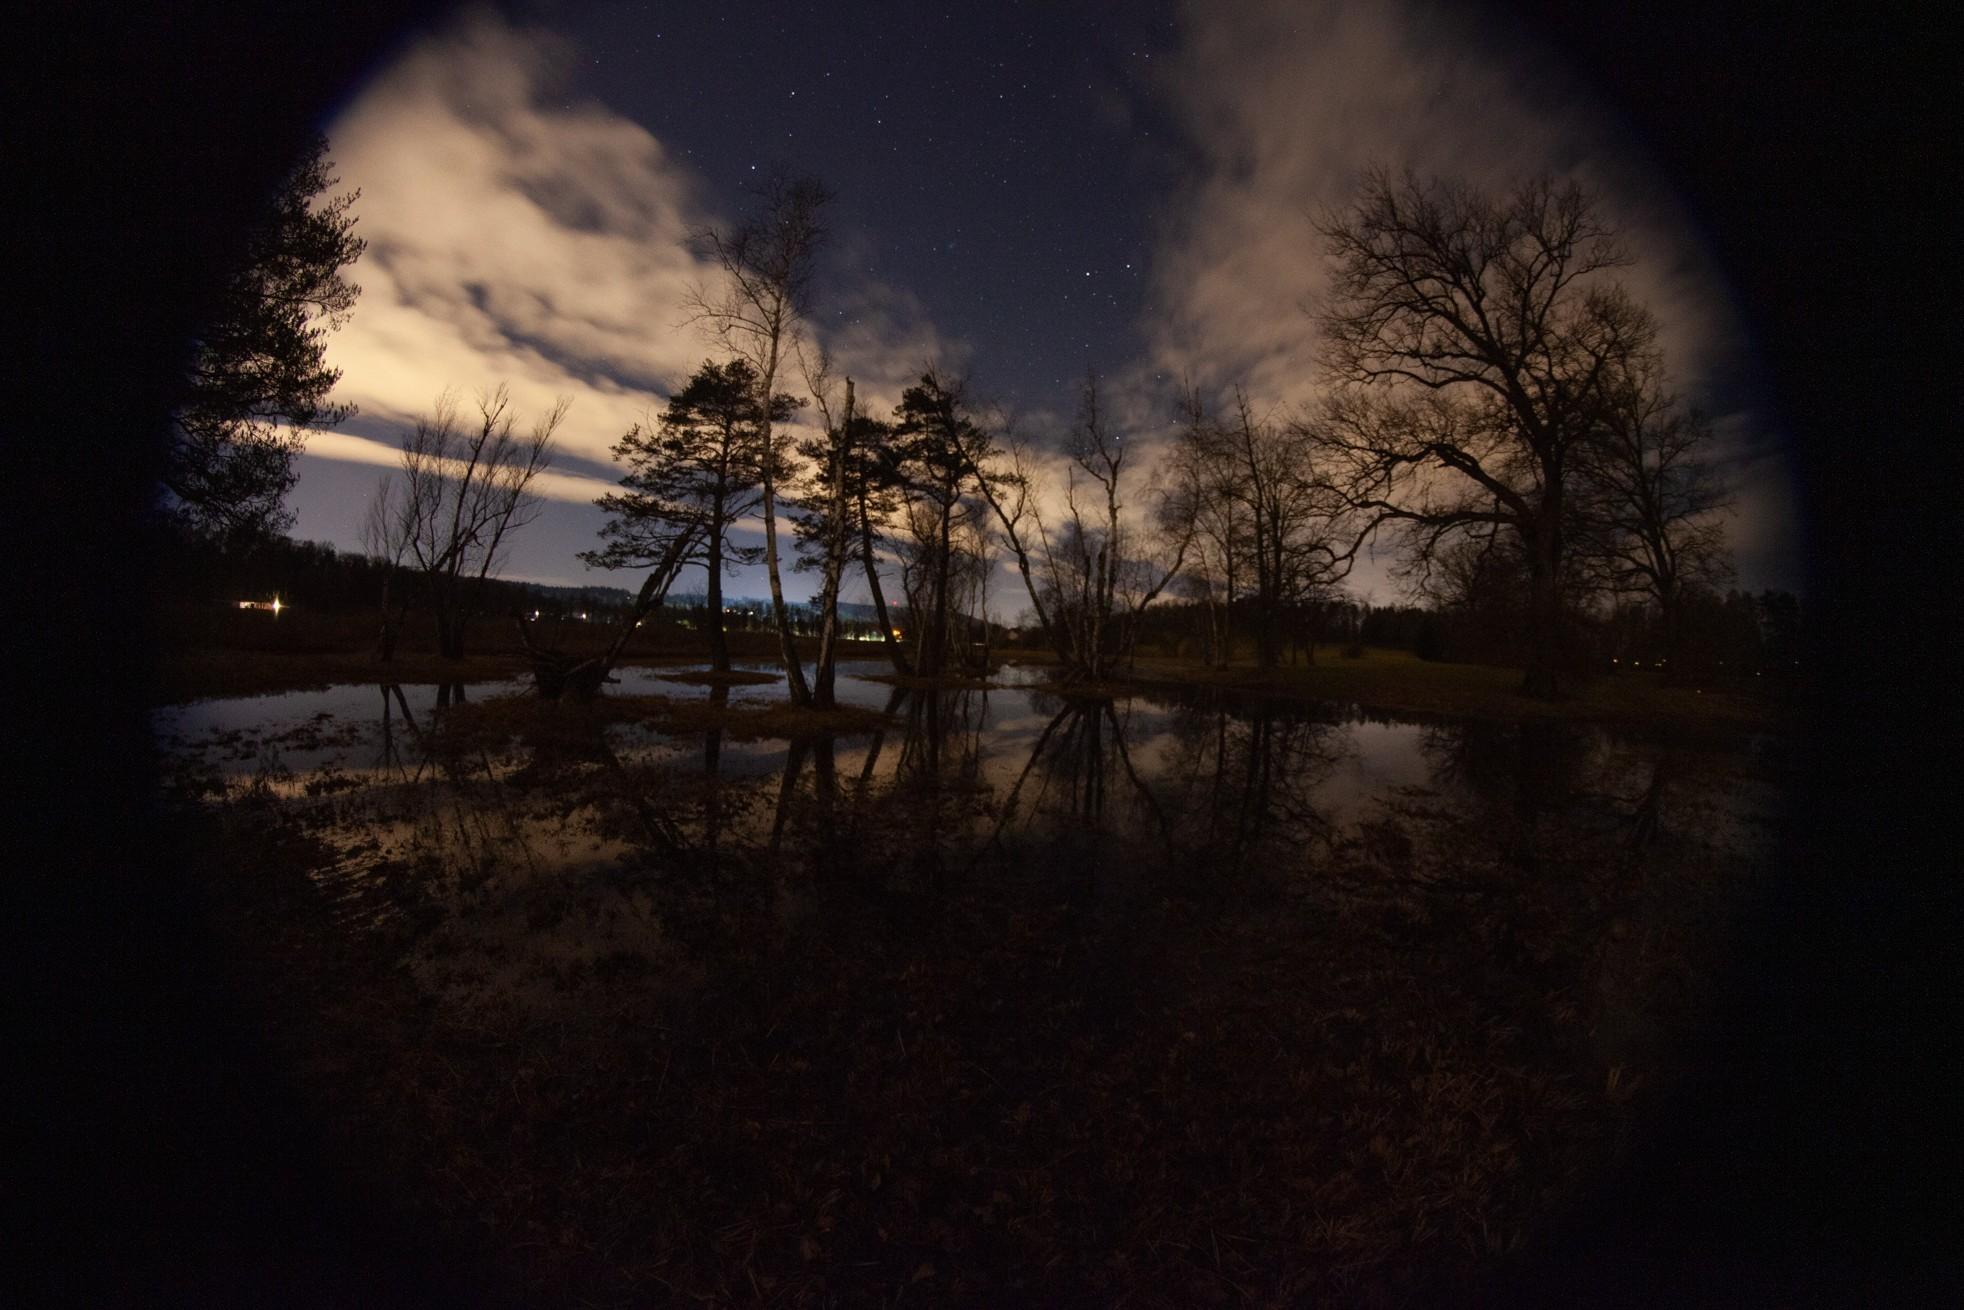 Naturschutzgebiet Katzensee Lichtverschmutzung